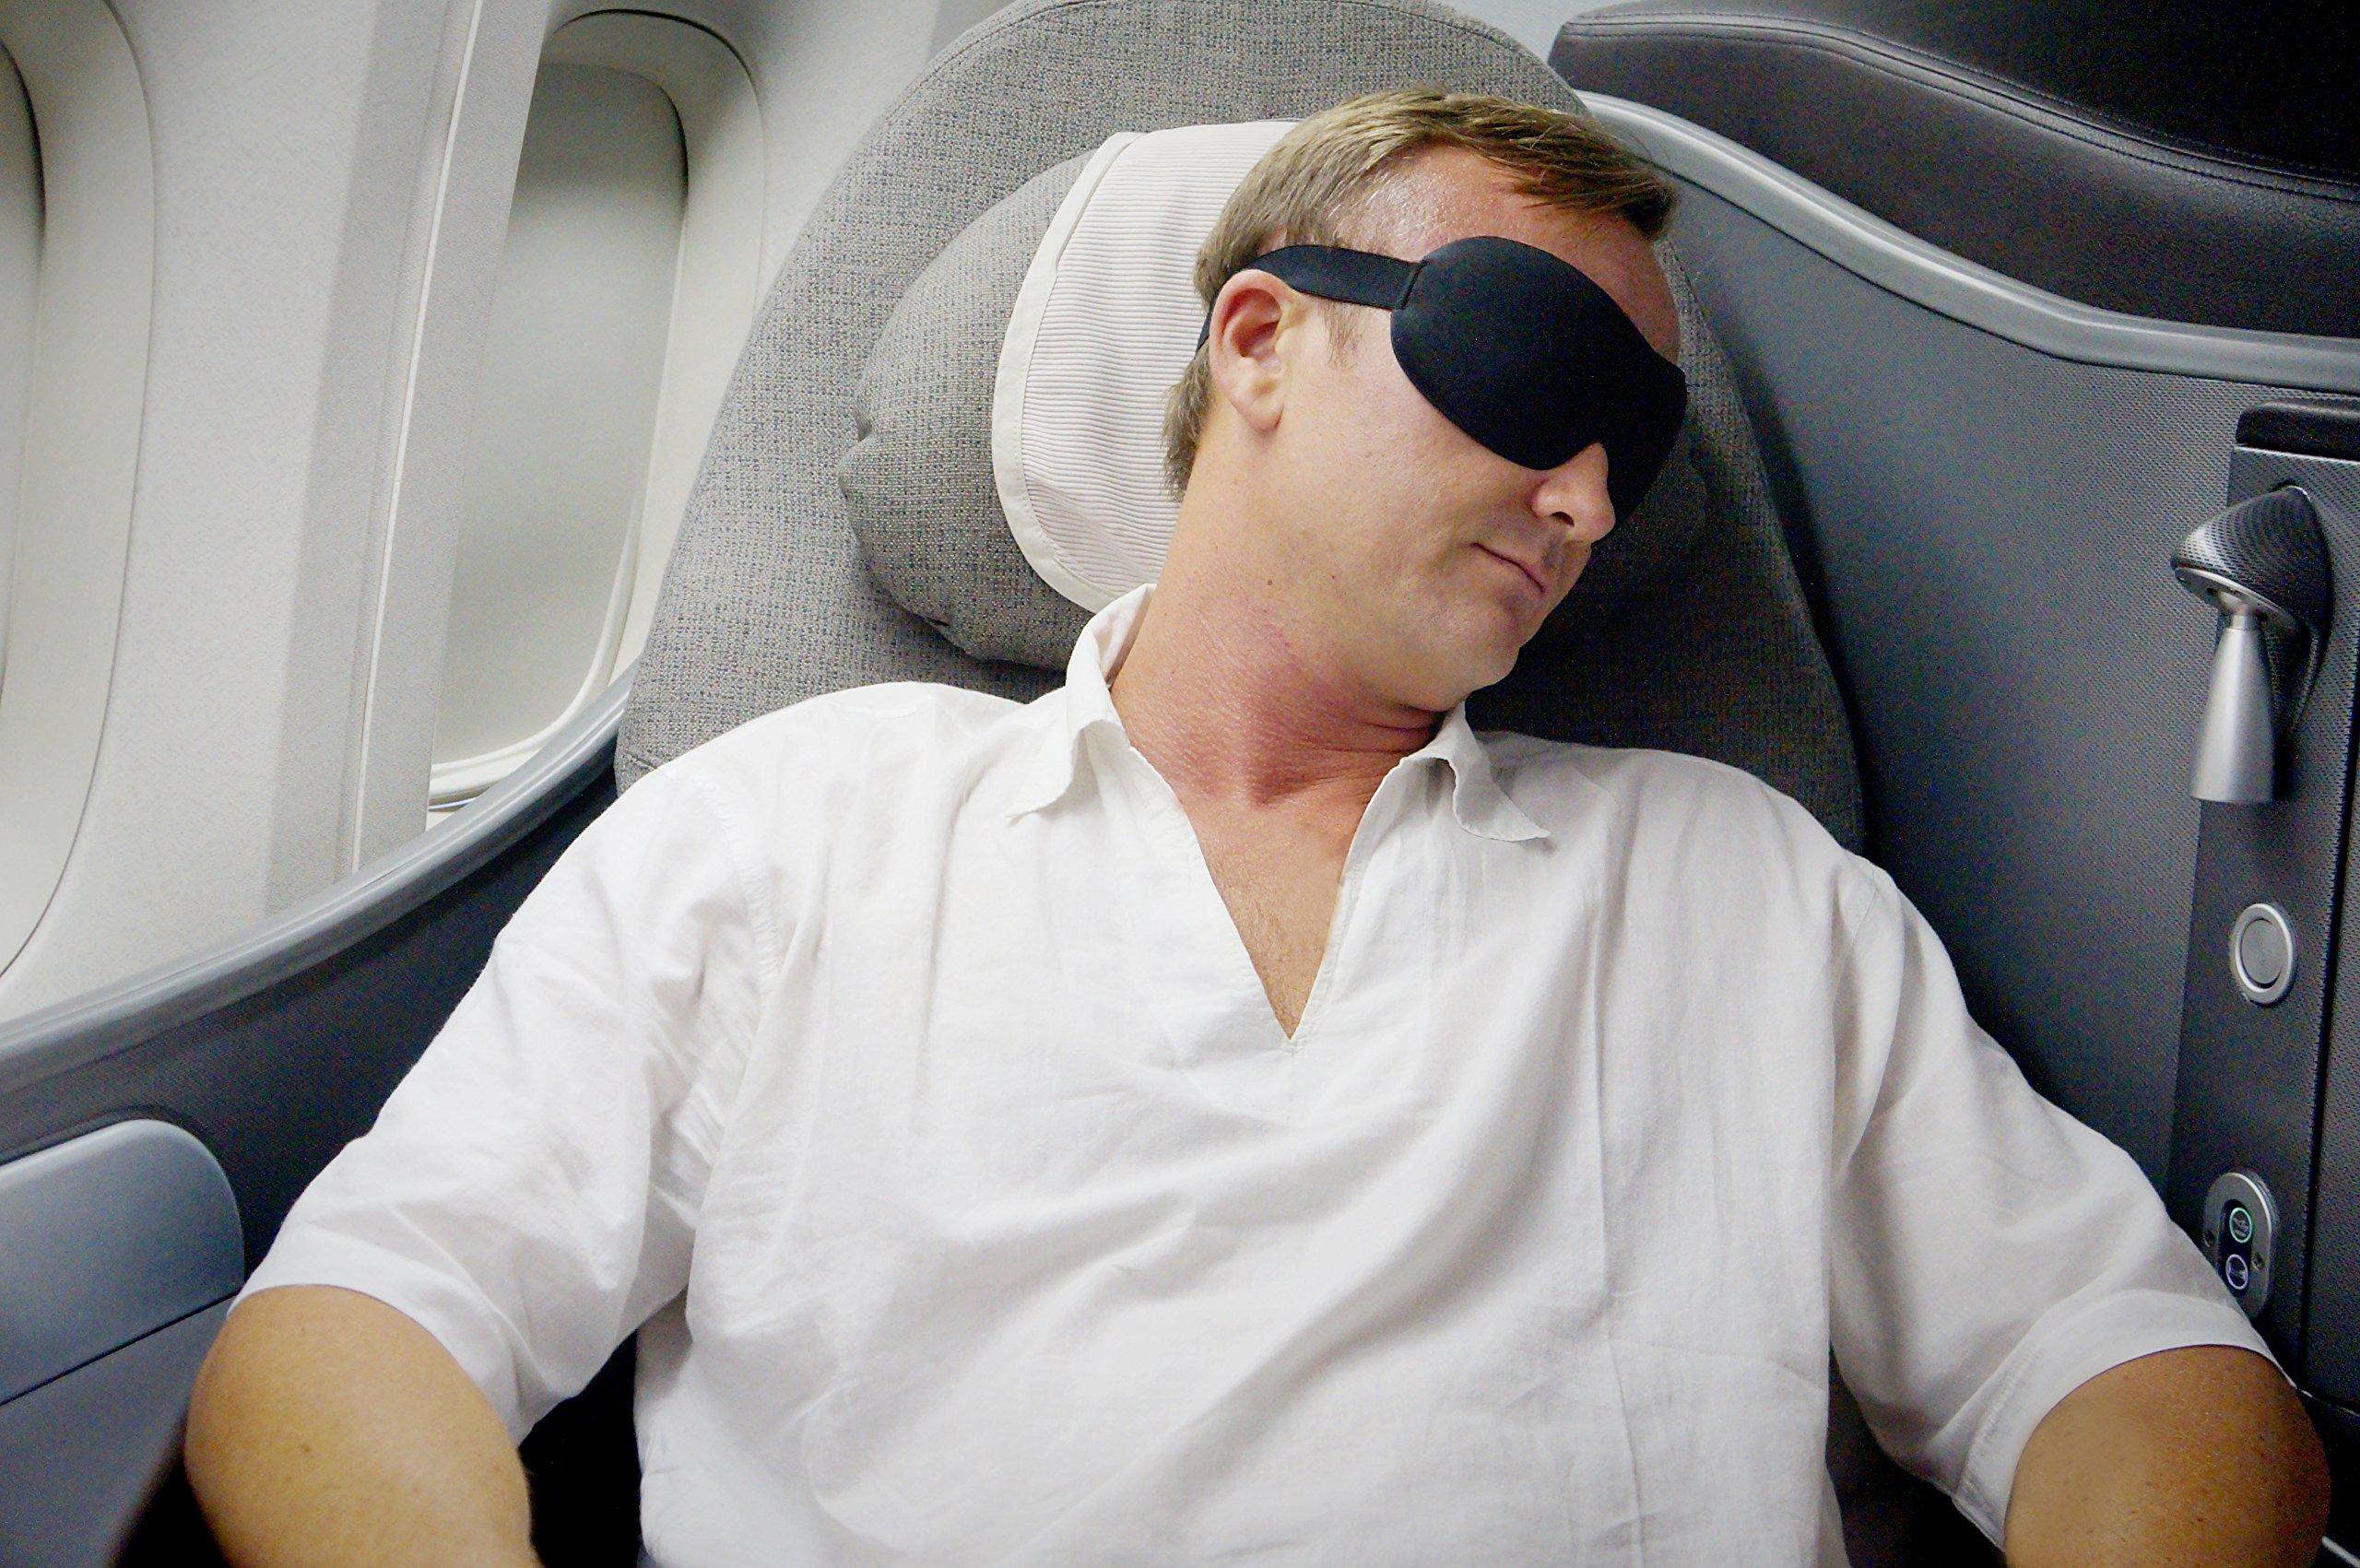 Luxury Patented Sleep Mask, Nidra Deep Rest Eye Mask with Contoured Shape and Adjustable Head Strap, Sleep Satisfaction Guaranteed, Sleep Anywhere, Anytime by Nidra (Image #6)